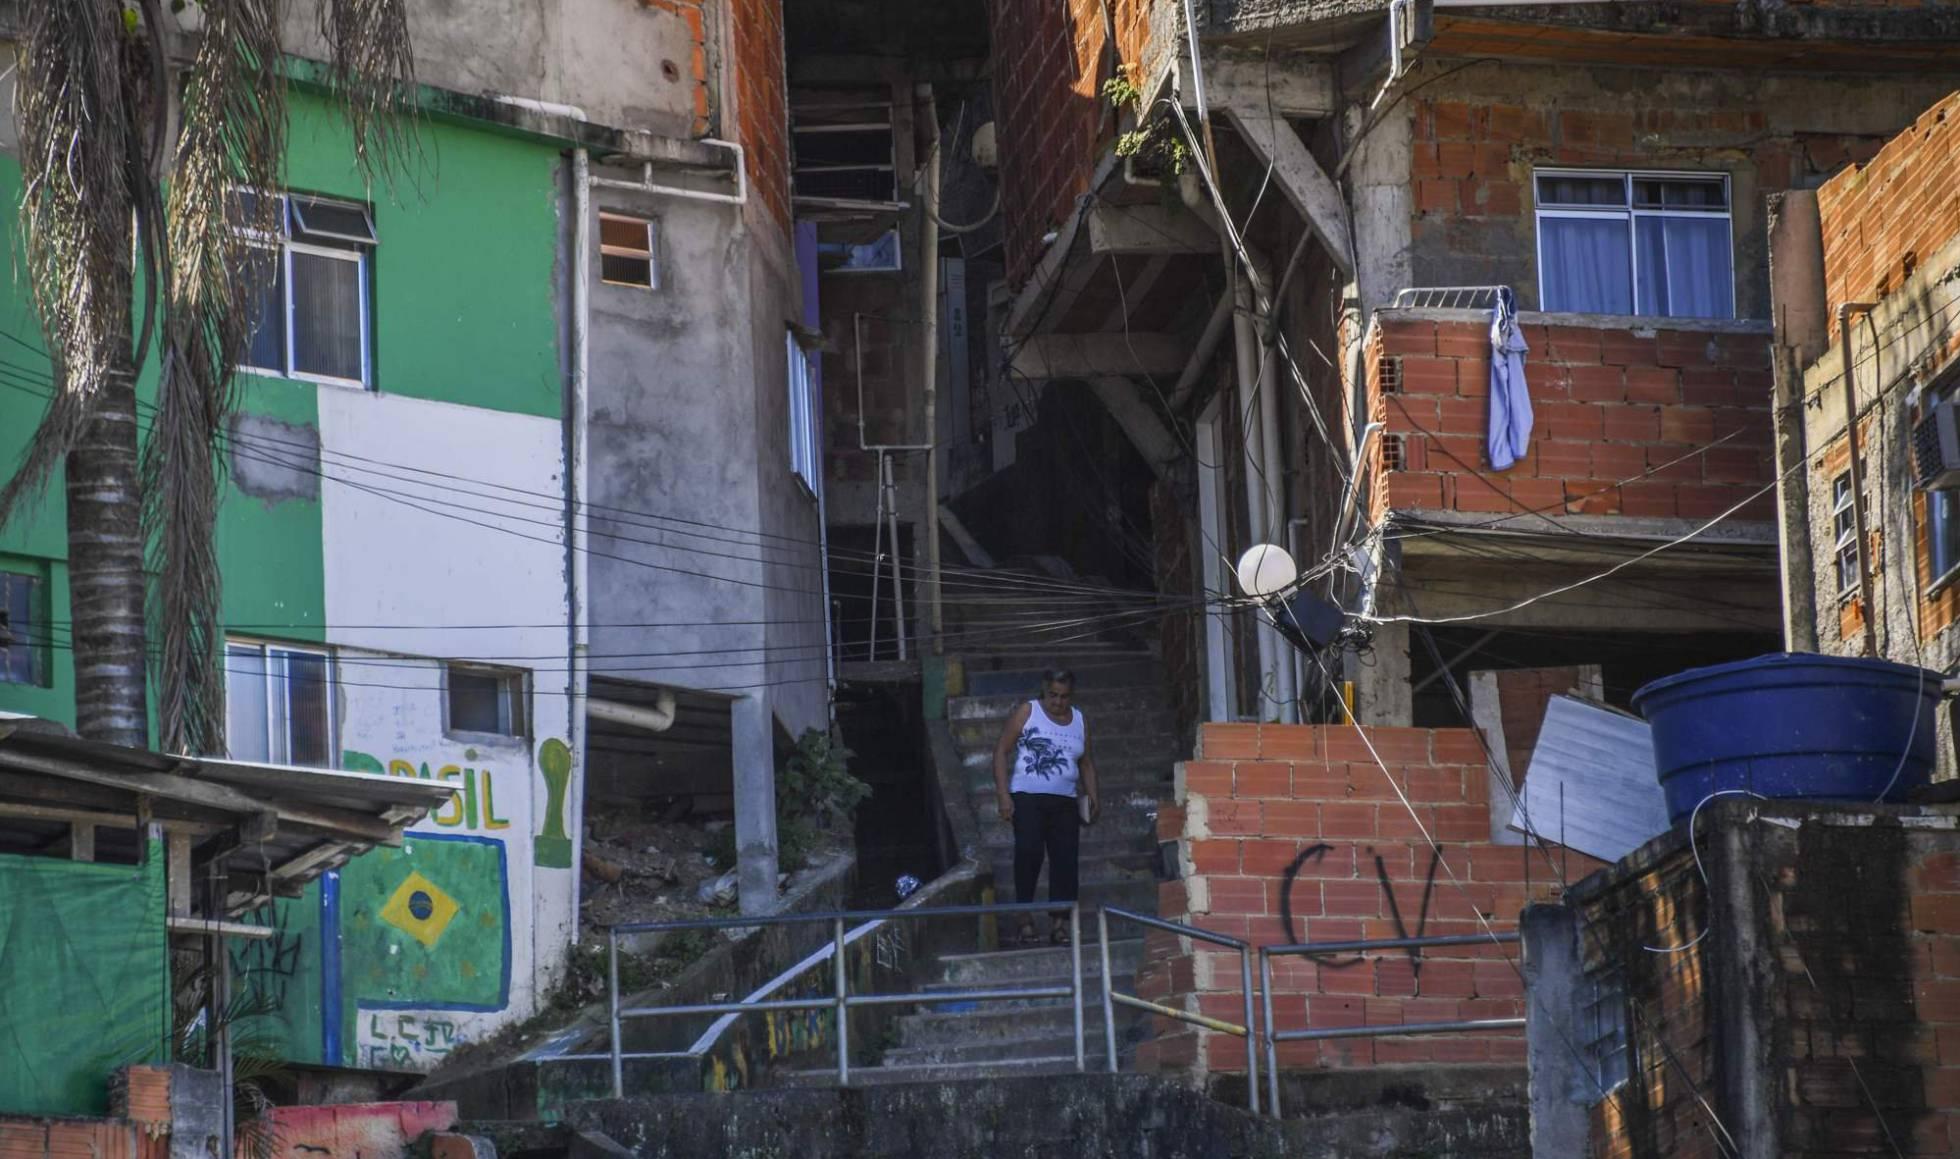 https://ep01.epimg.net/brasil/imagenes/2017/09/22/politica/1506096531_079176_1506097311_noticia_normal_recorte1.jpg